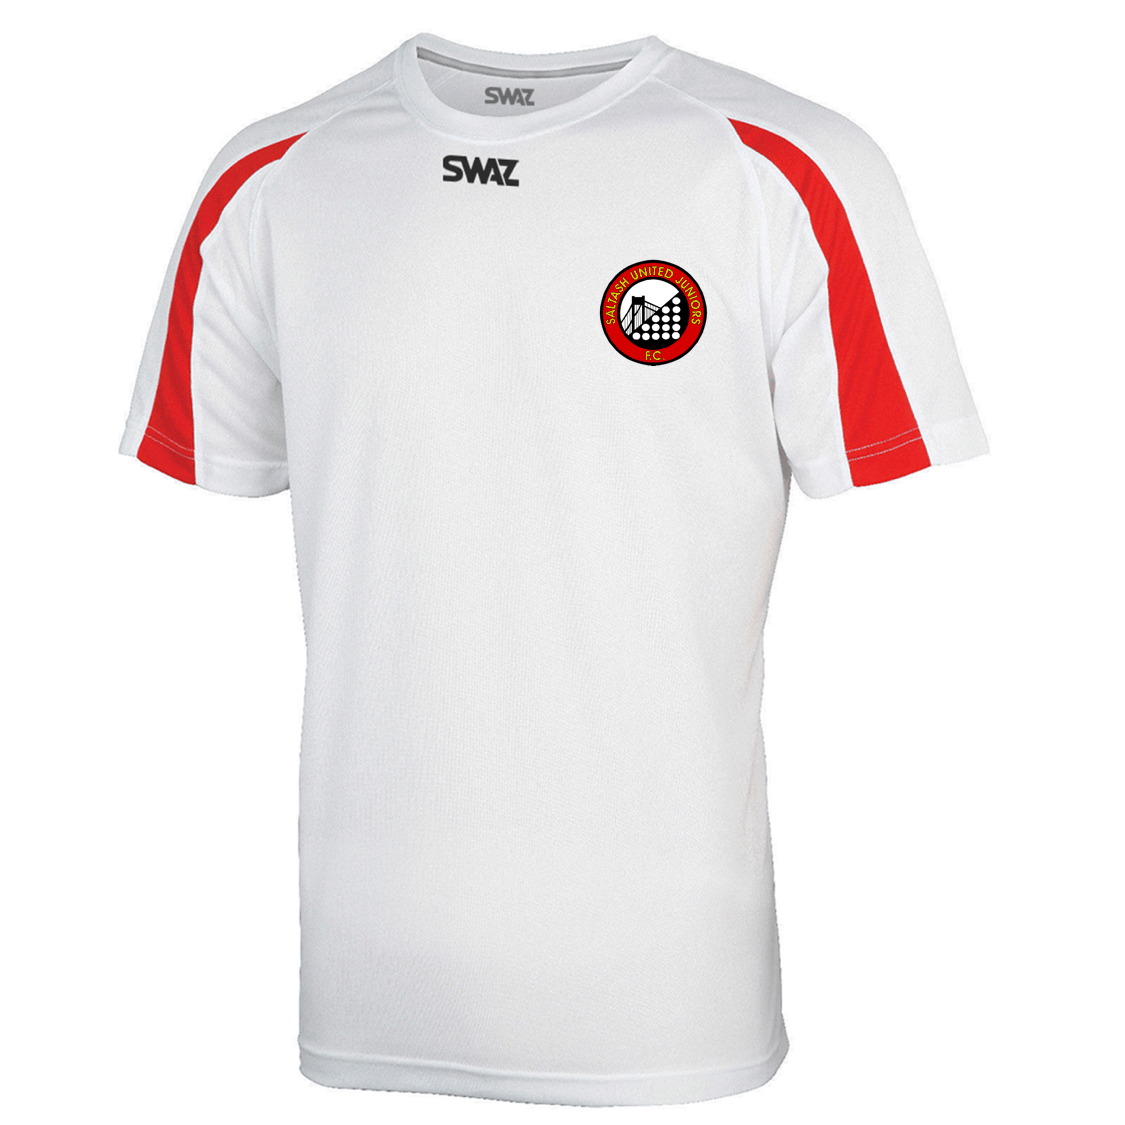 Saltash United Training T-Shirt   SWAZ Teamwear   Football Kit Supplier